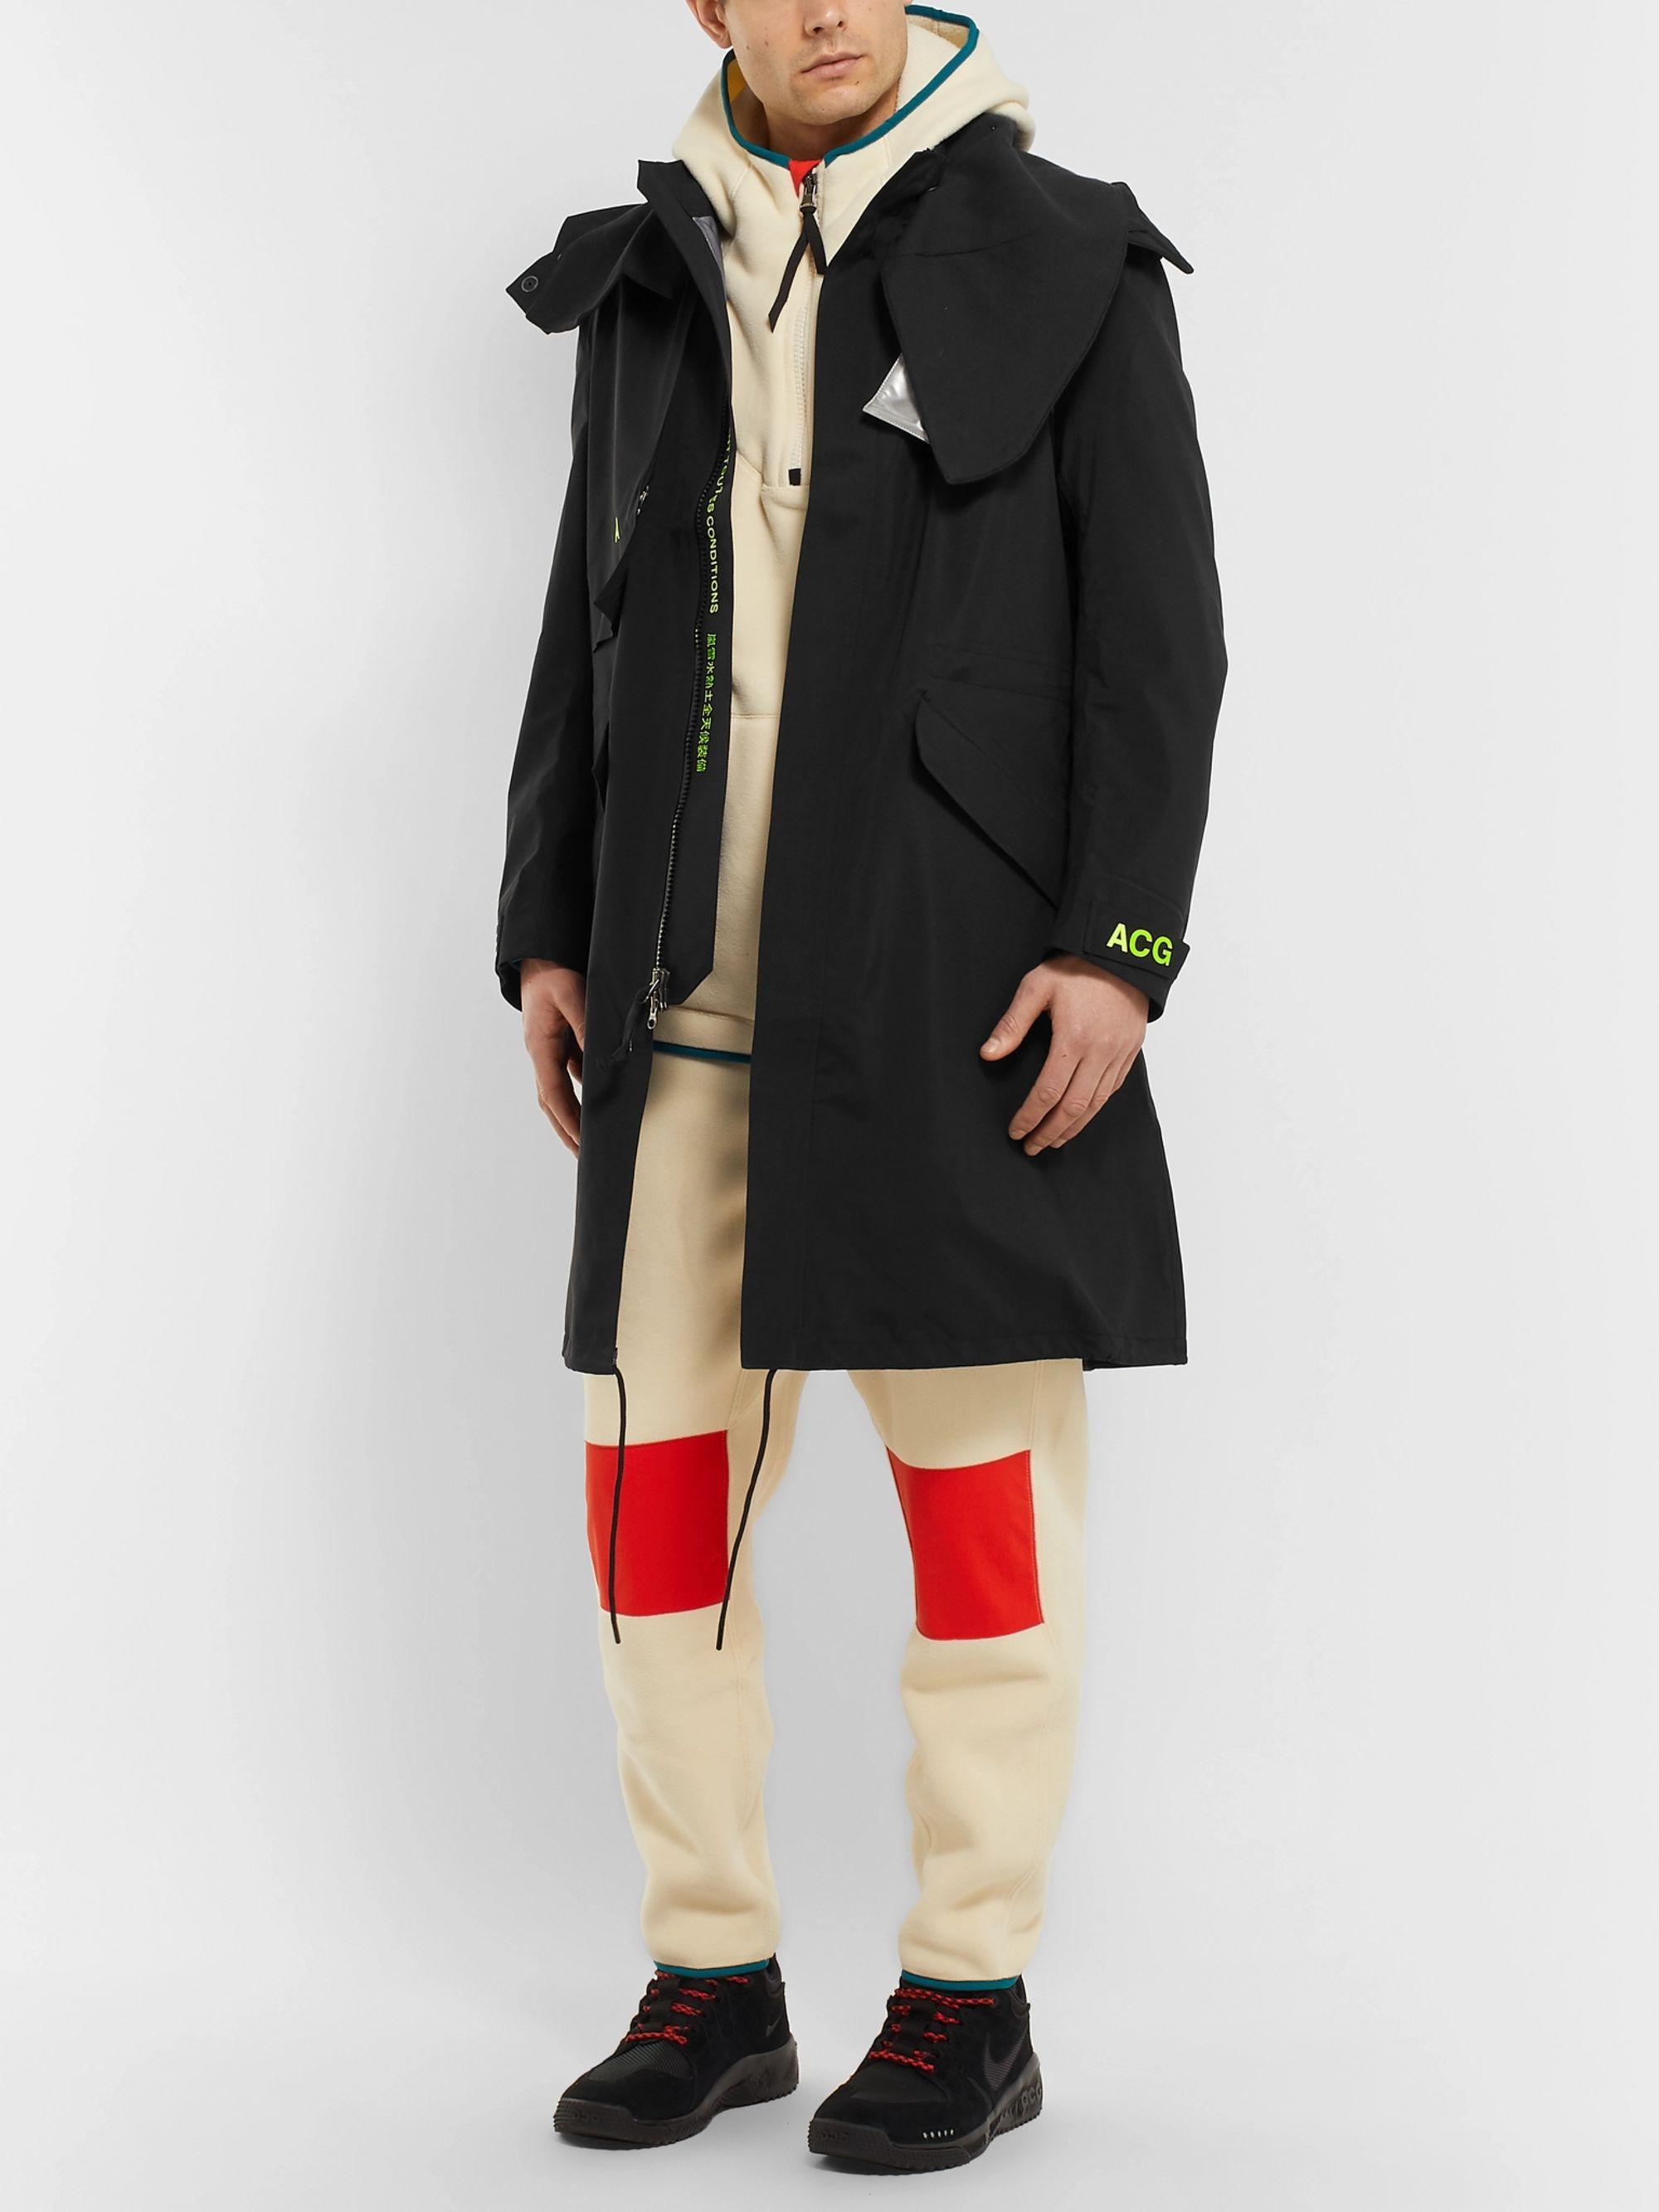 nike acg trench coat